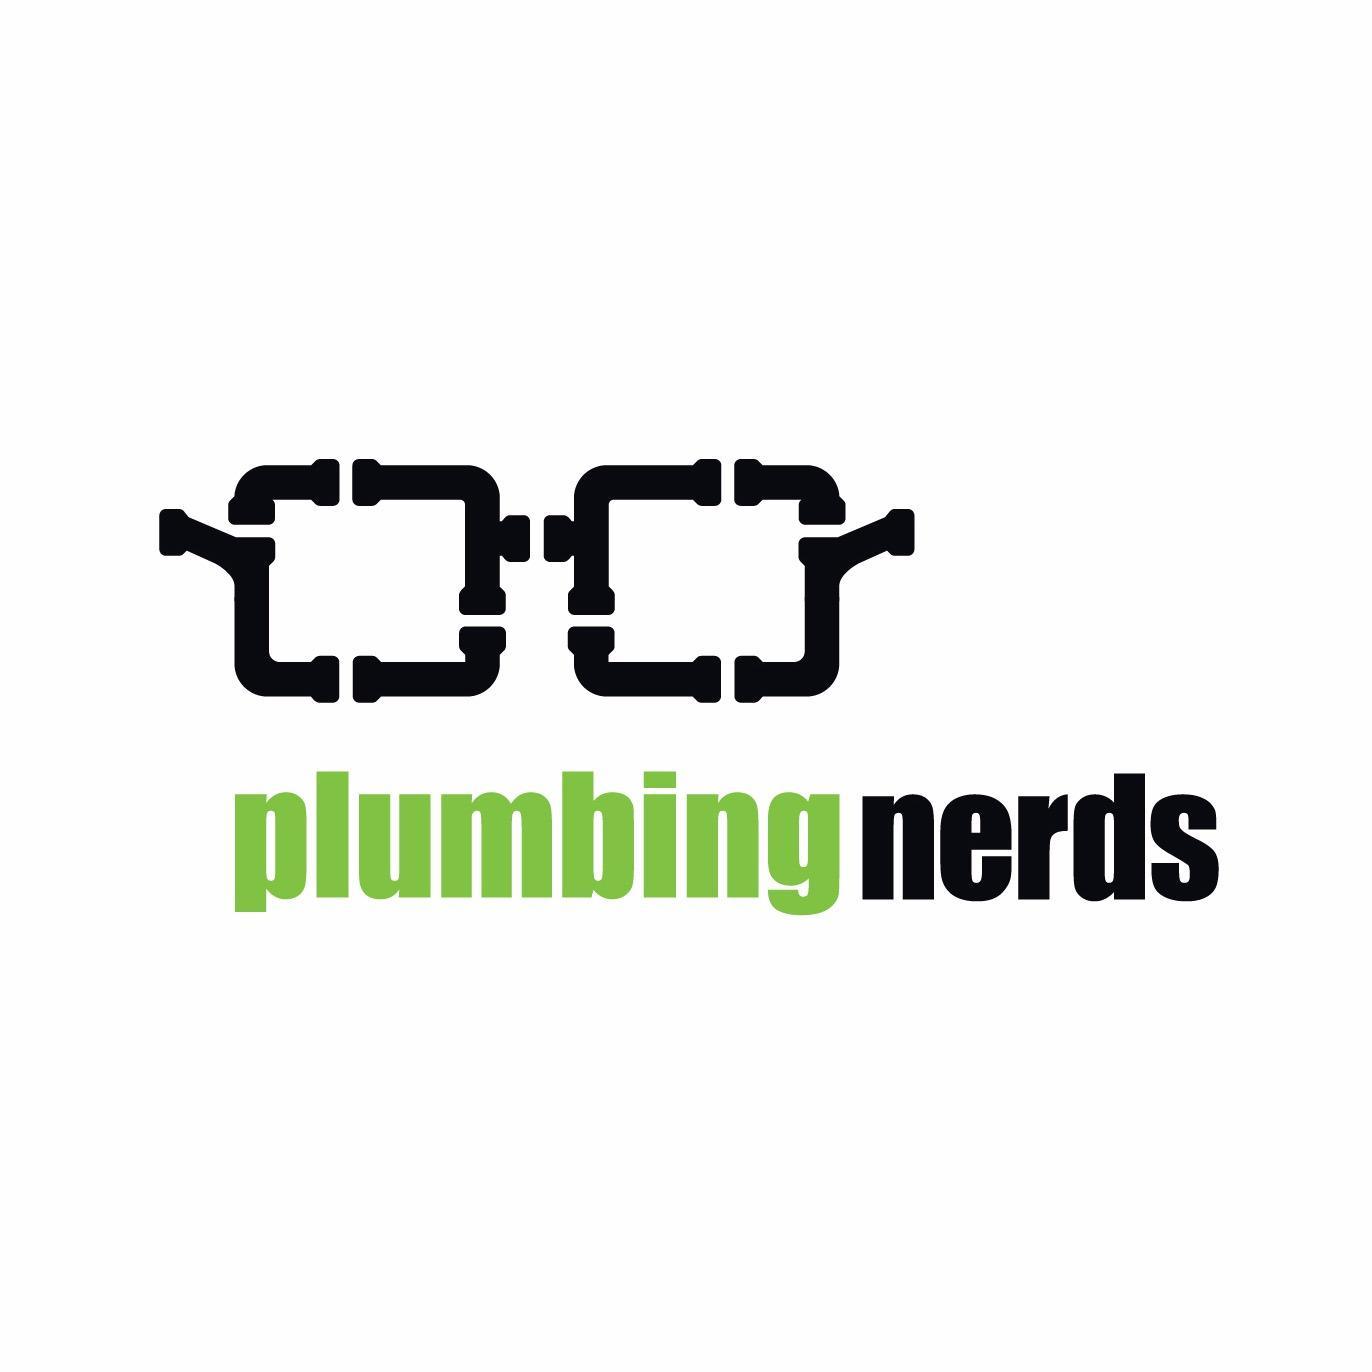 Plumbing Nerds